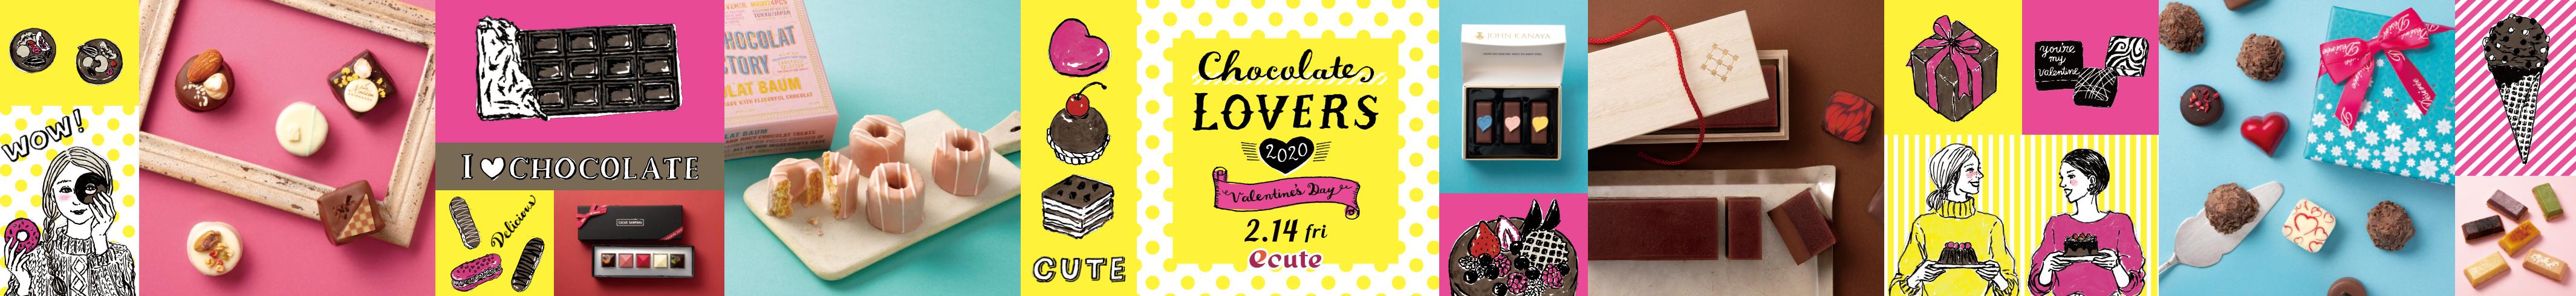 Chocolate LOVERS 2020